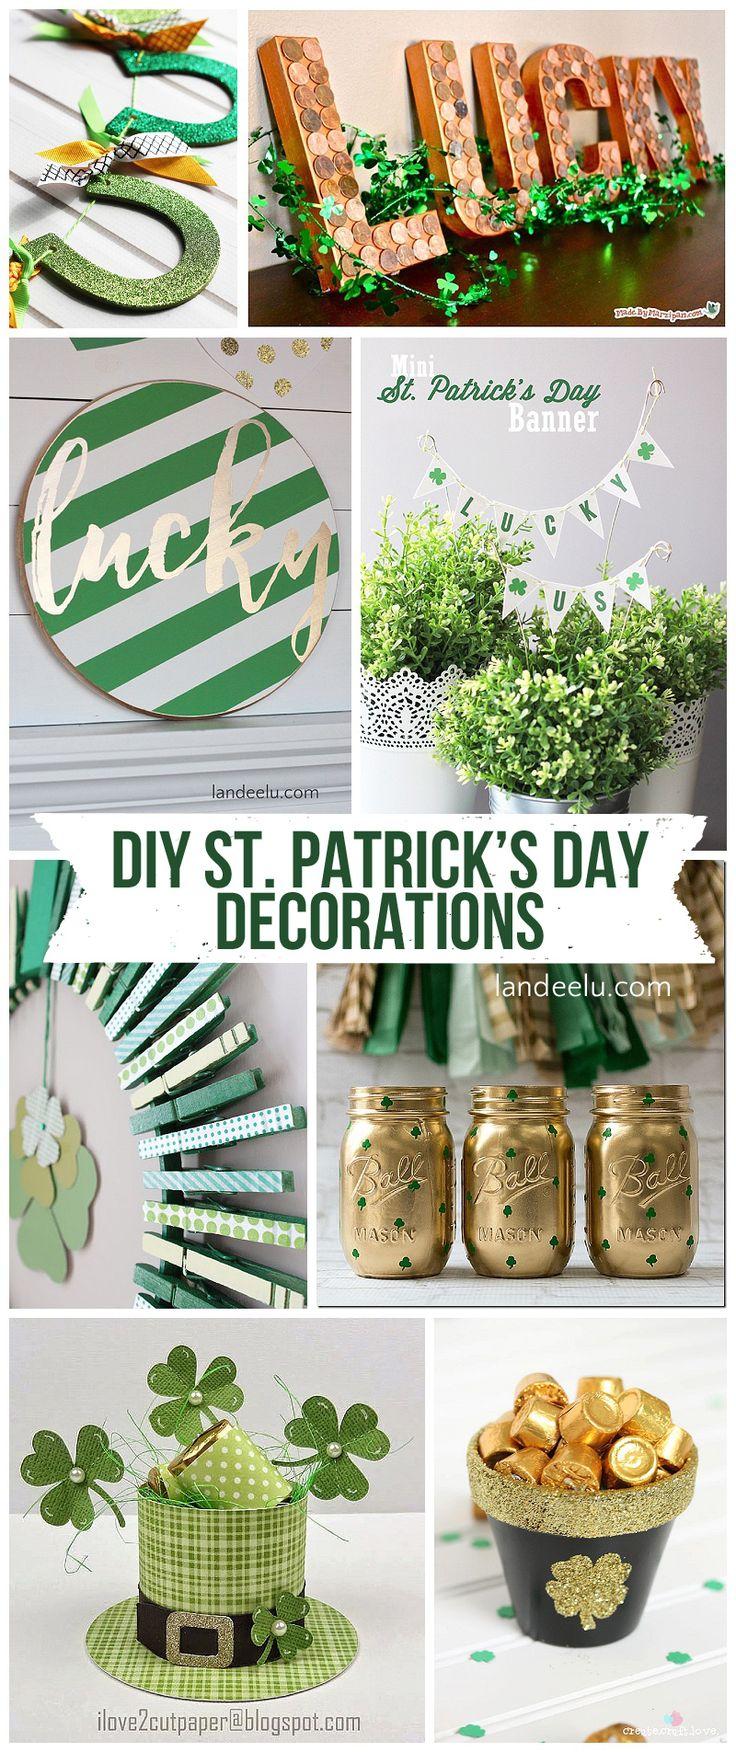 DIY St. Patrick's Day Decorations! So many awesome ideas!   landeelu.com